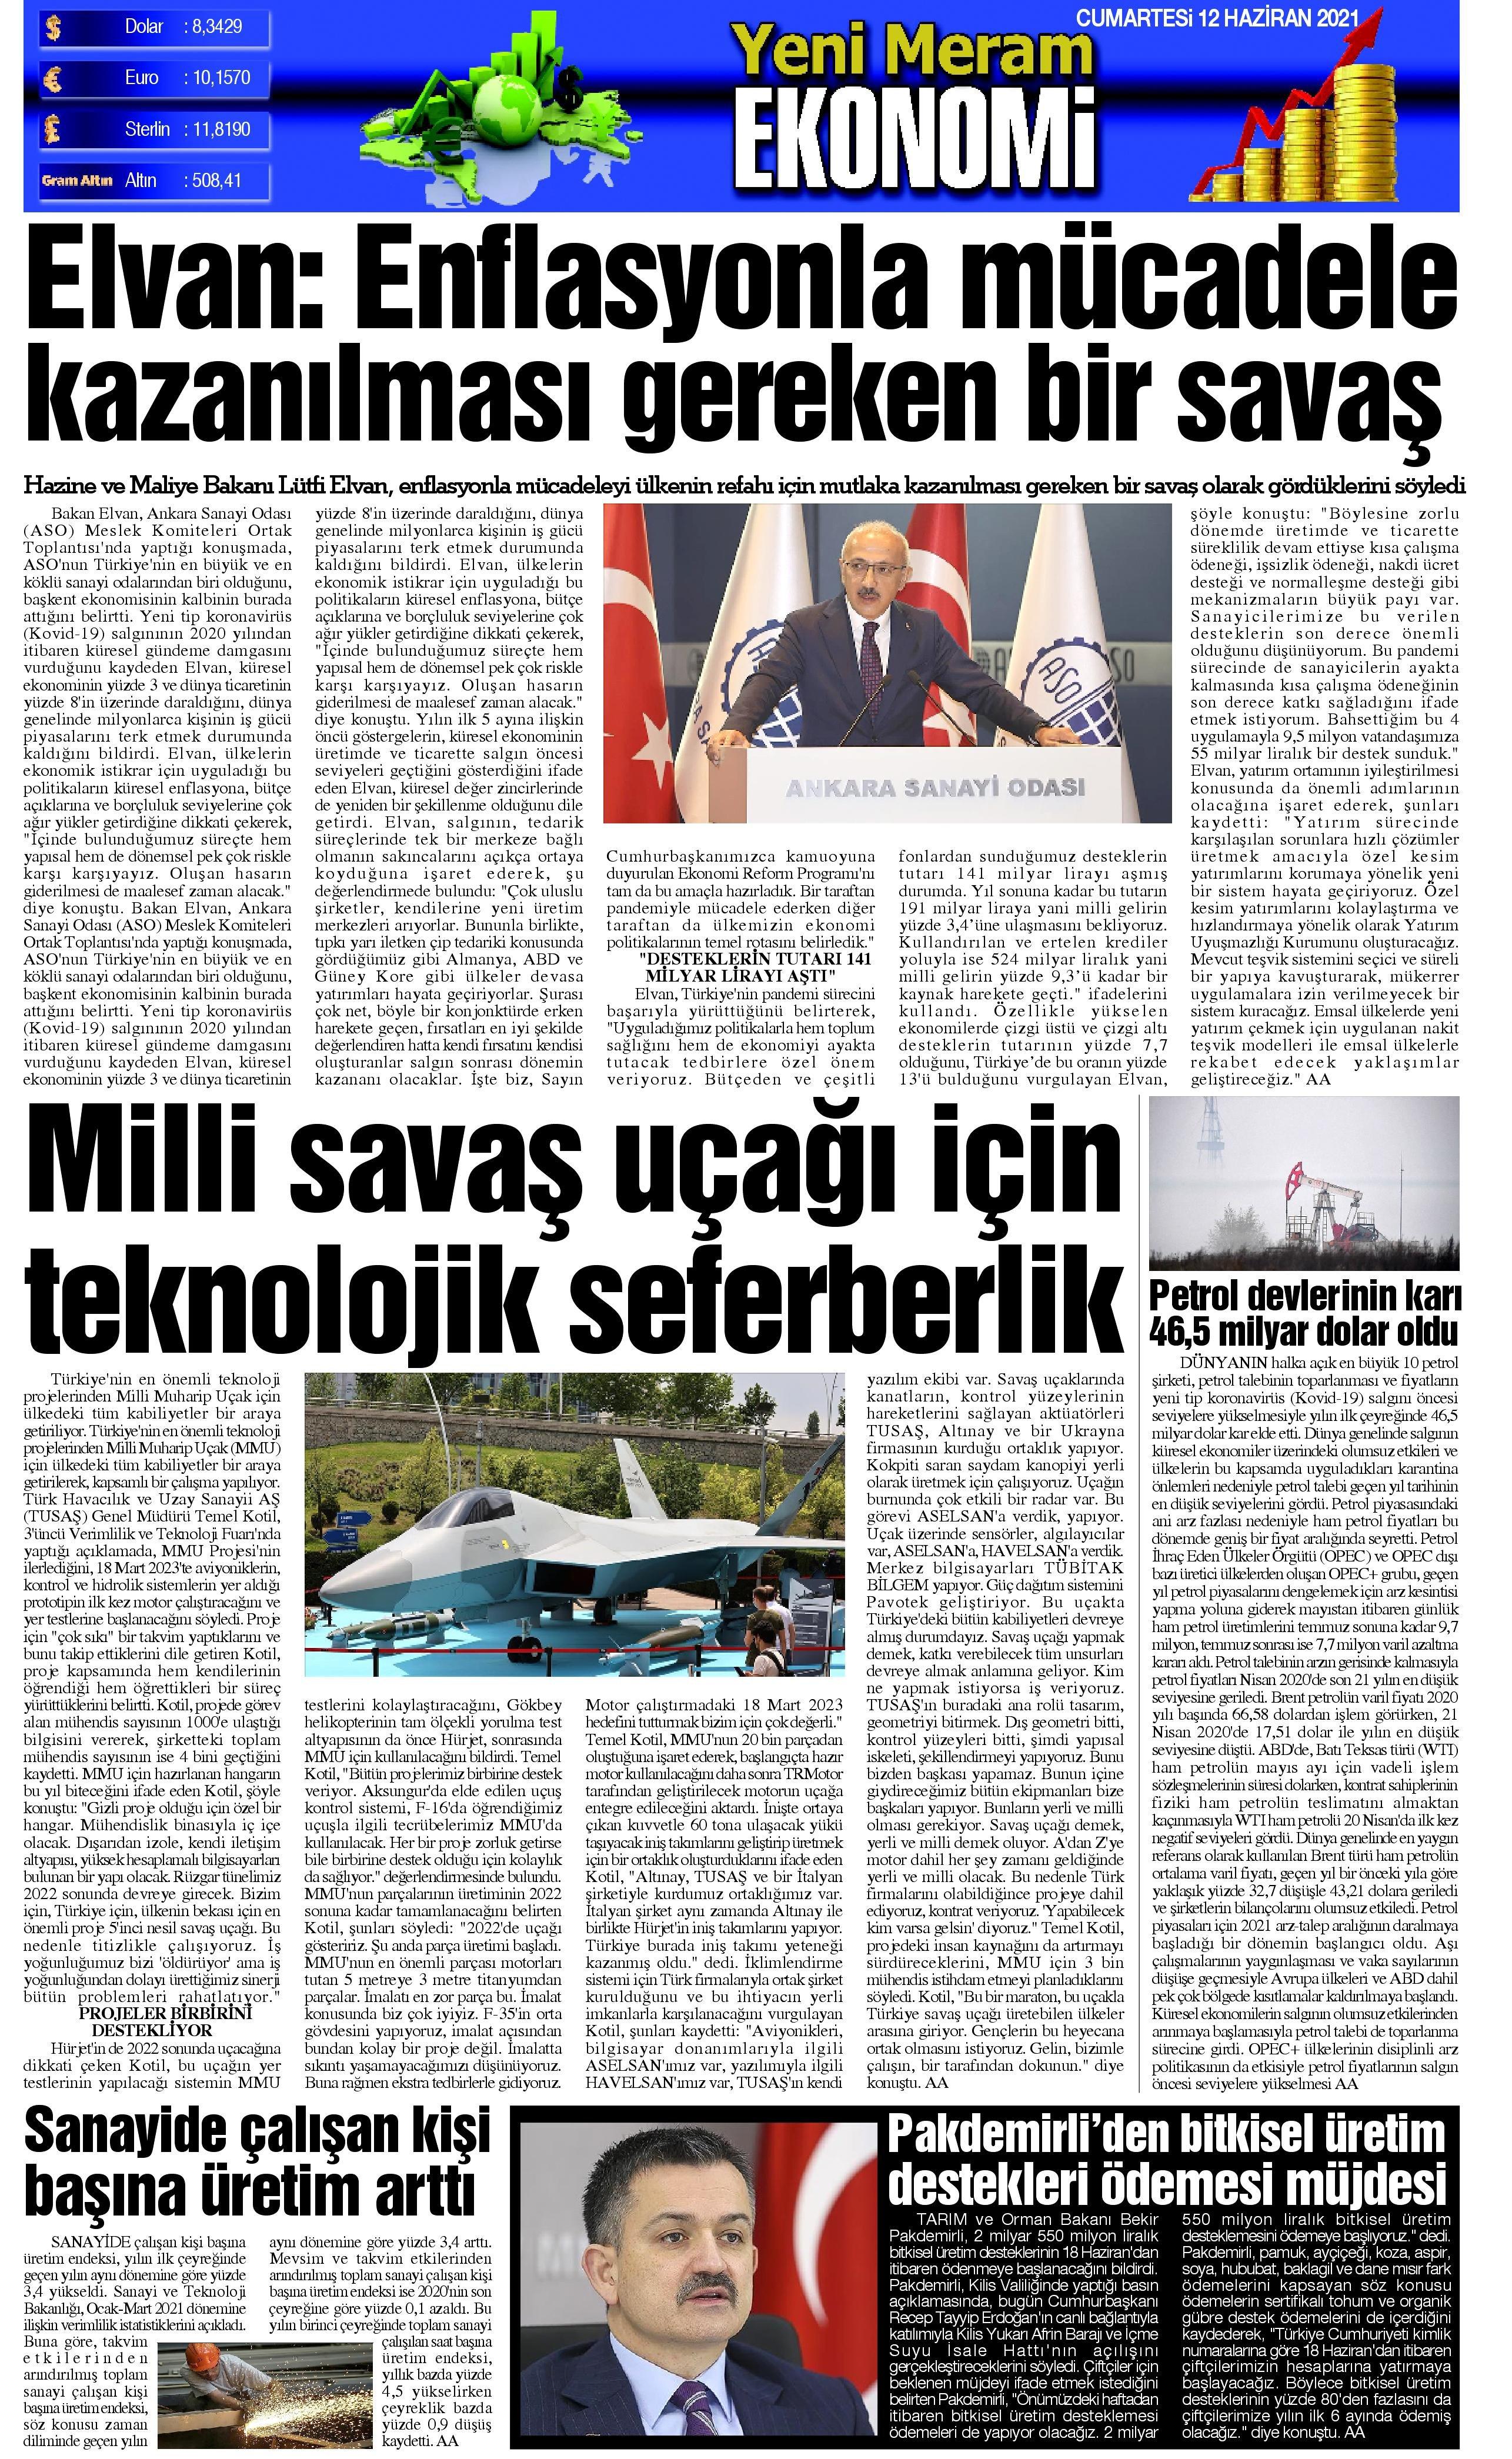 12 Haziran 2021 Yeni Meram Gazetesi